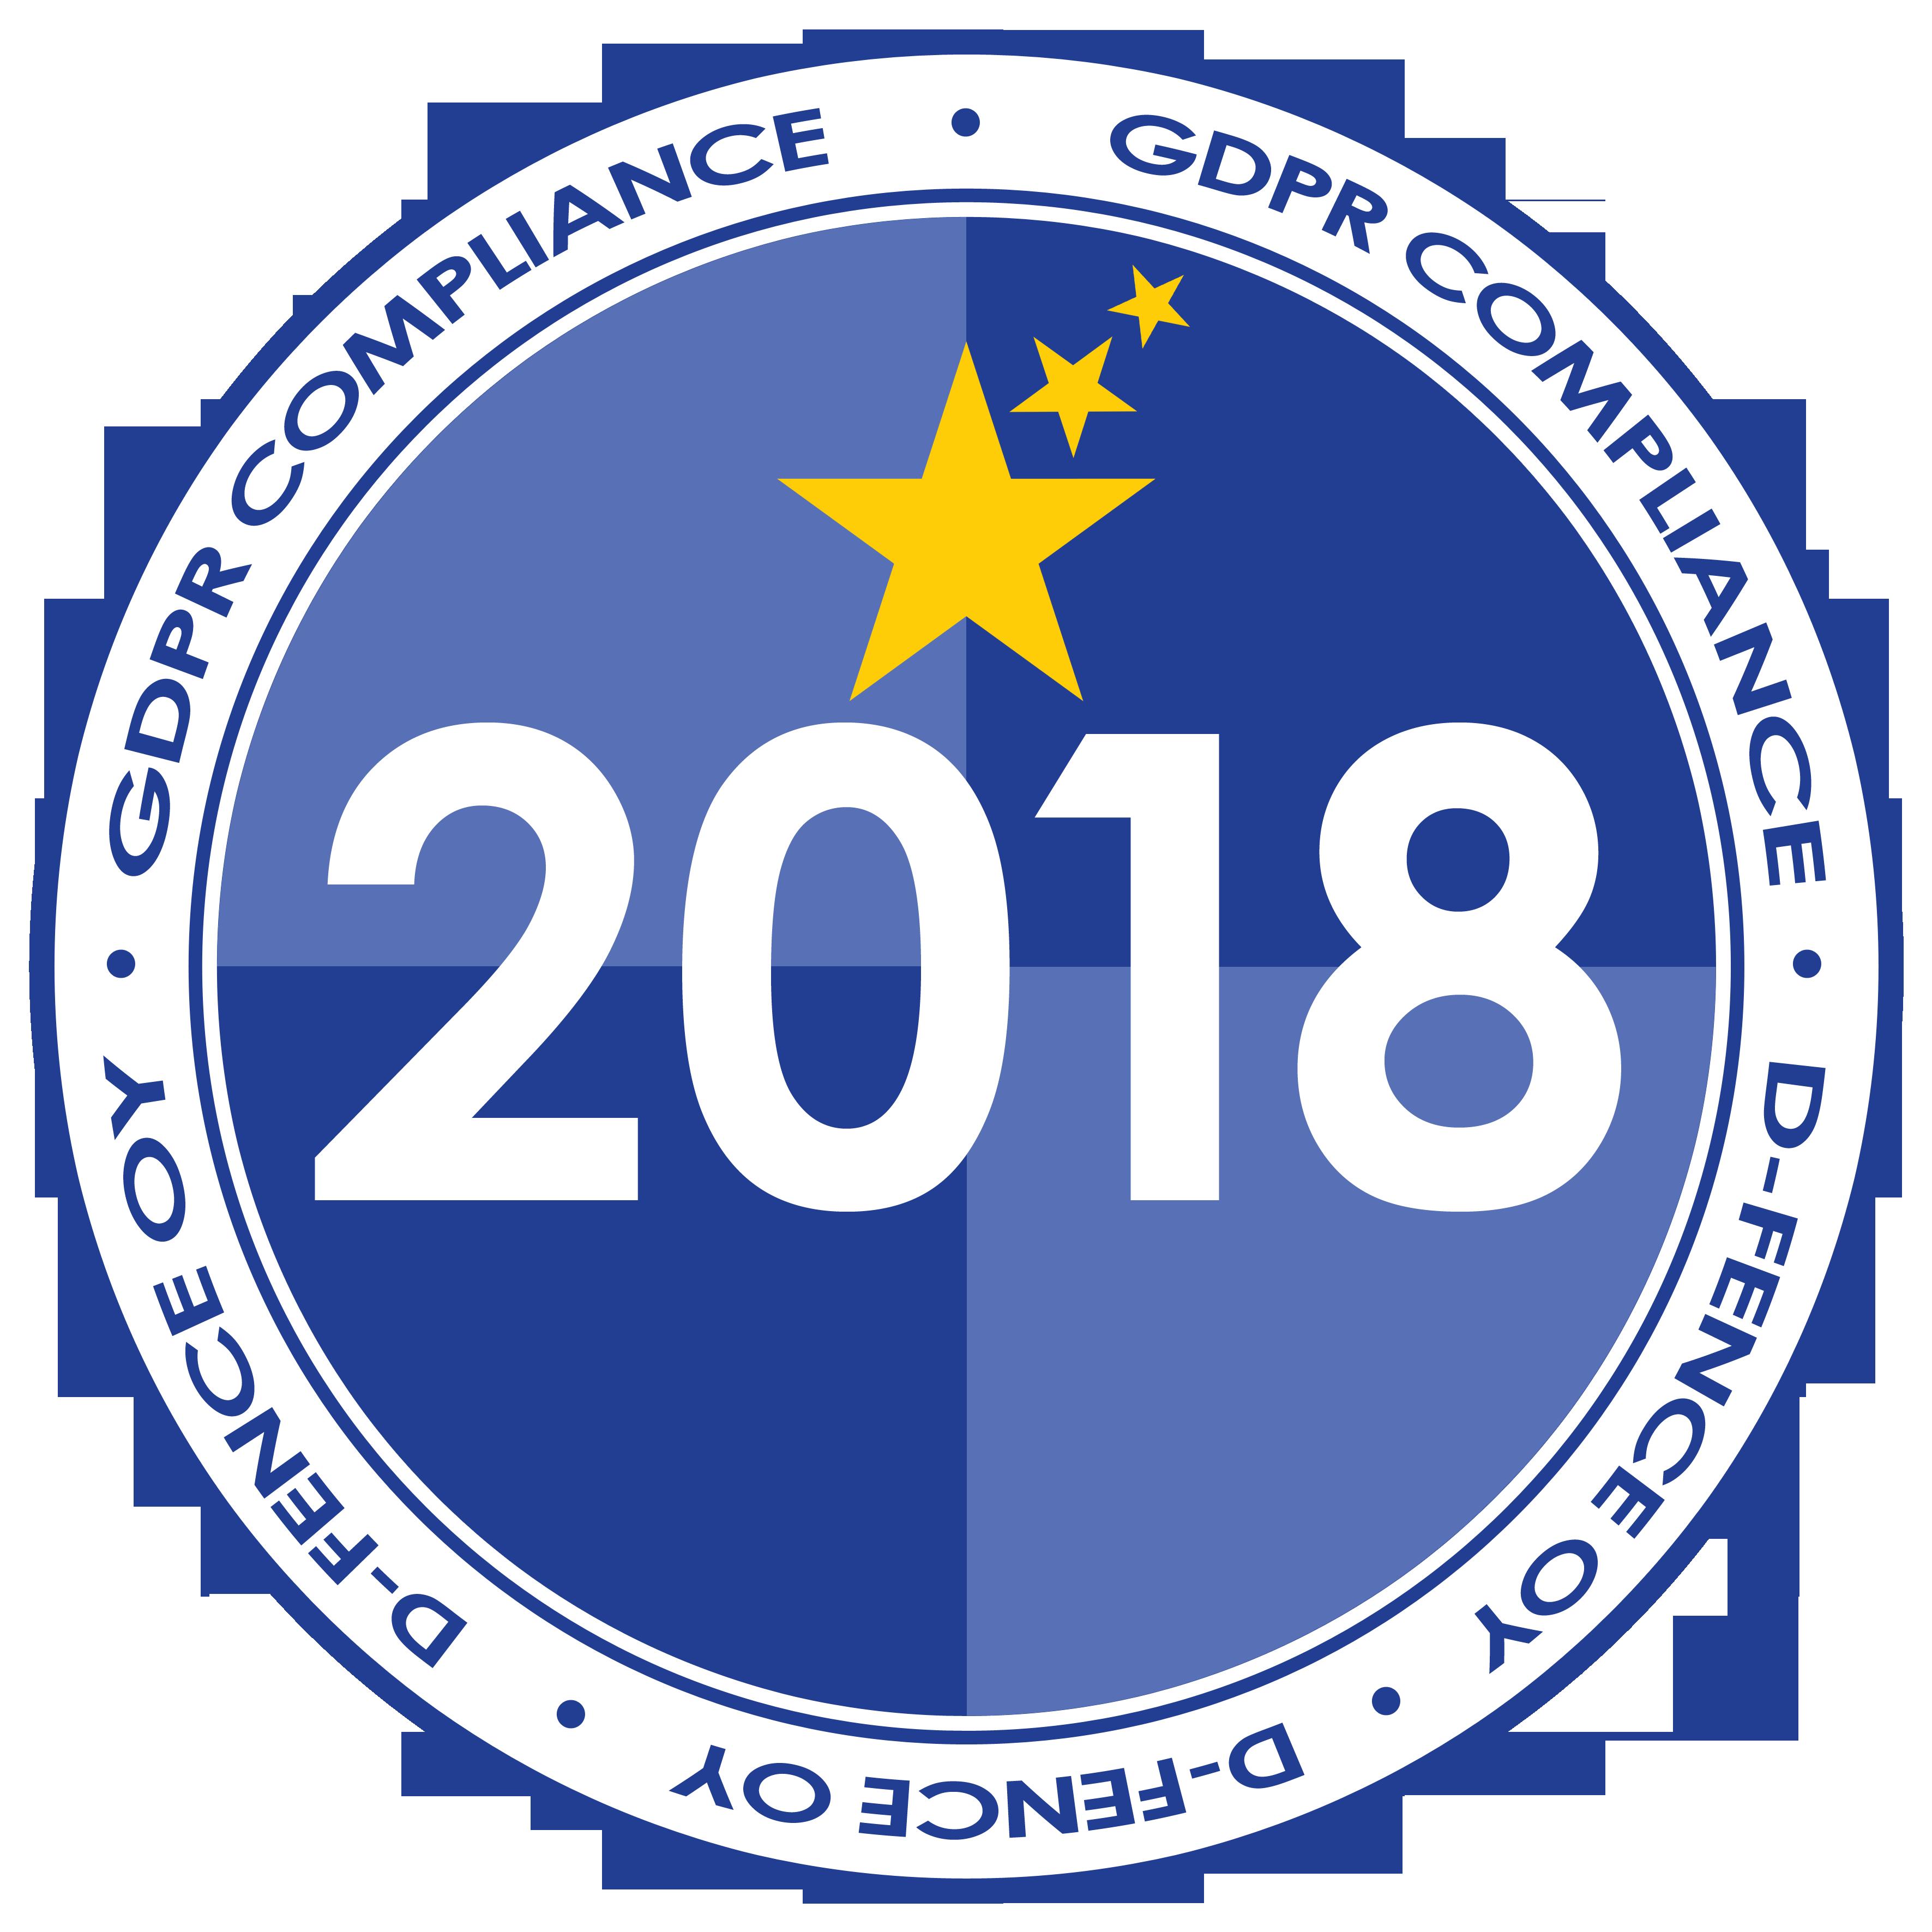 GDPR Compliance D-Fence 2018